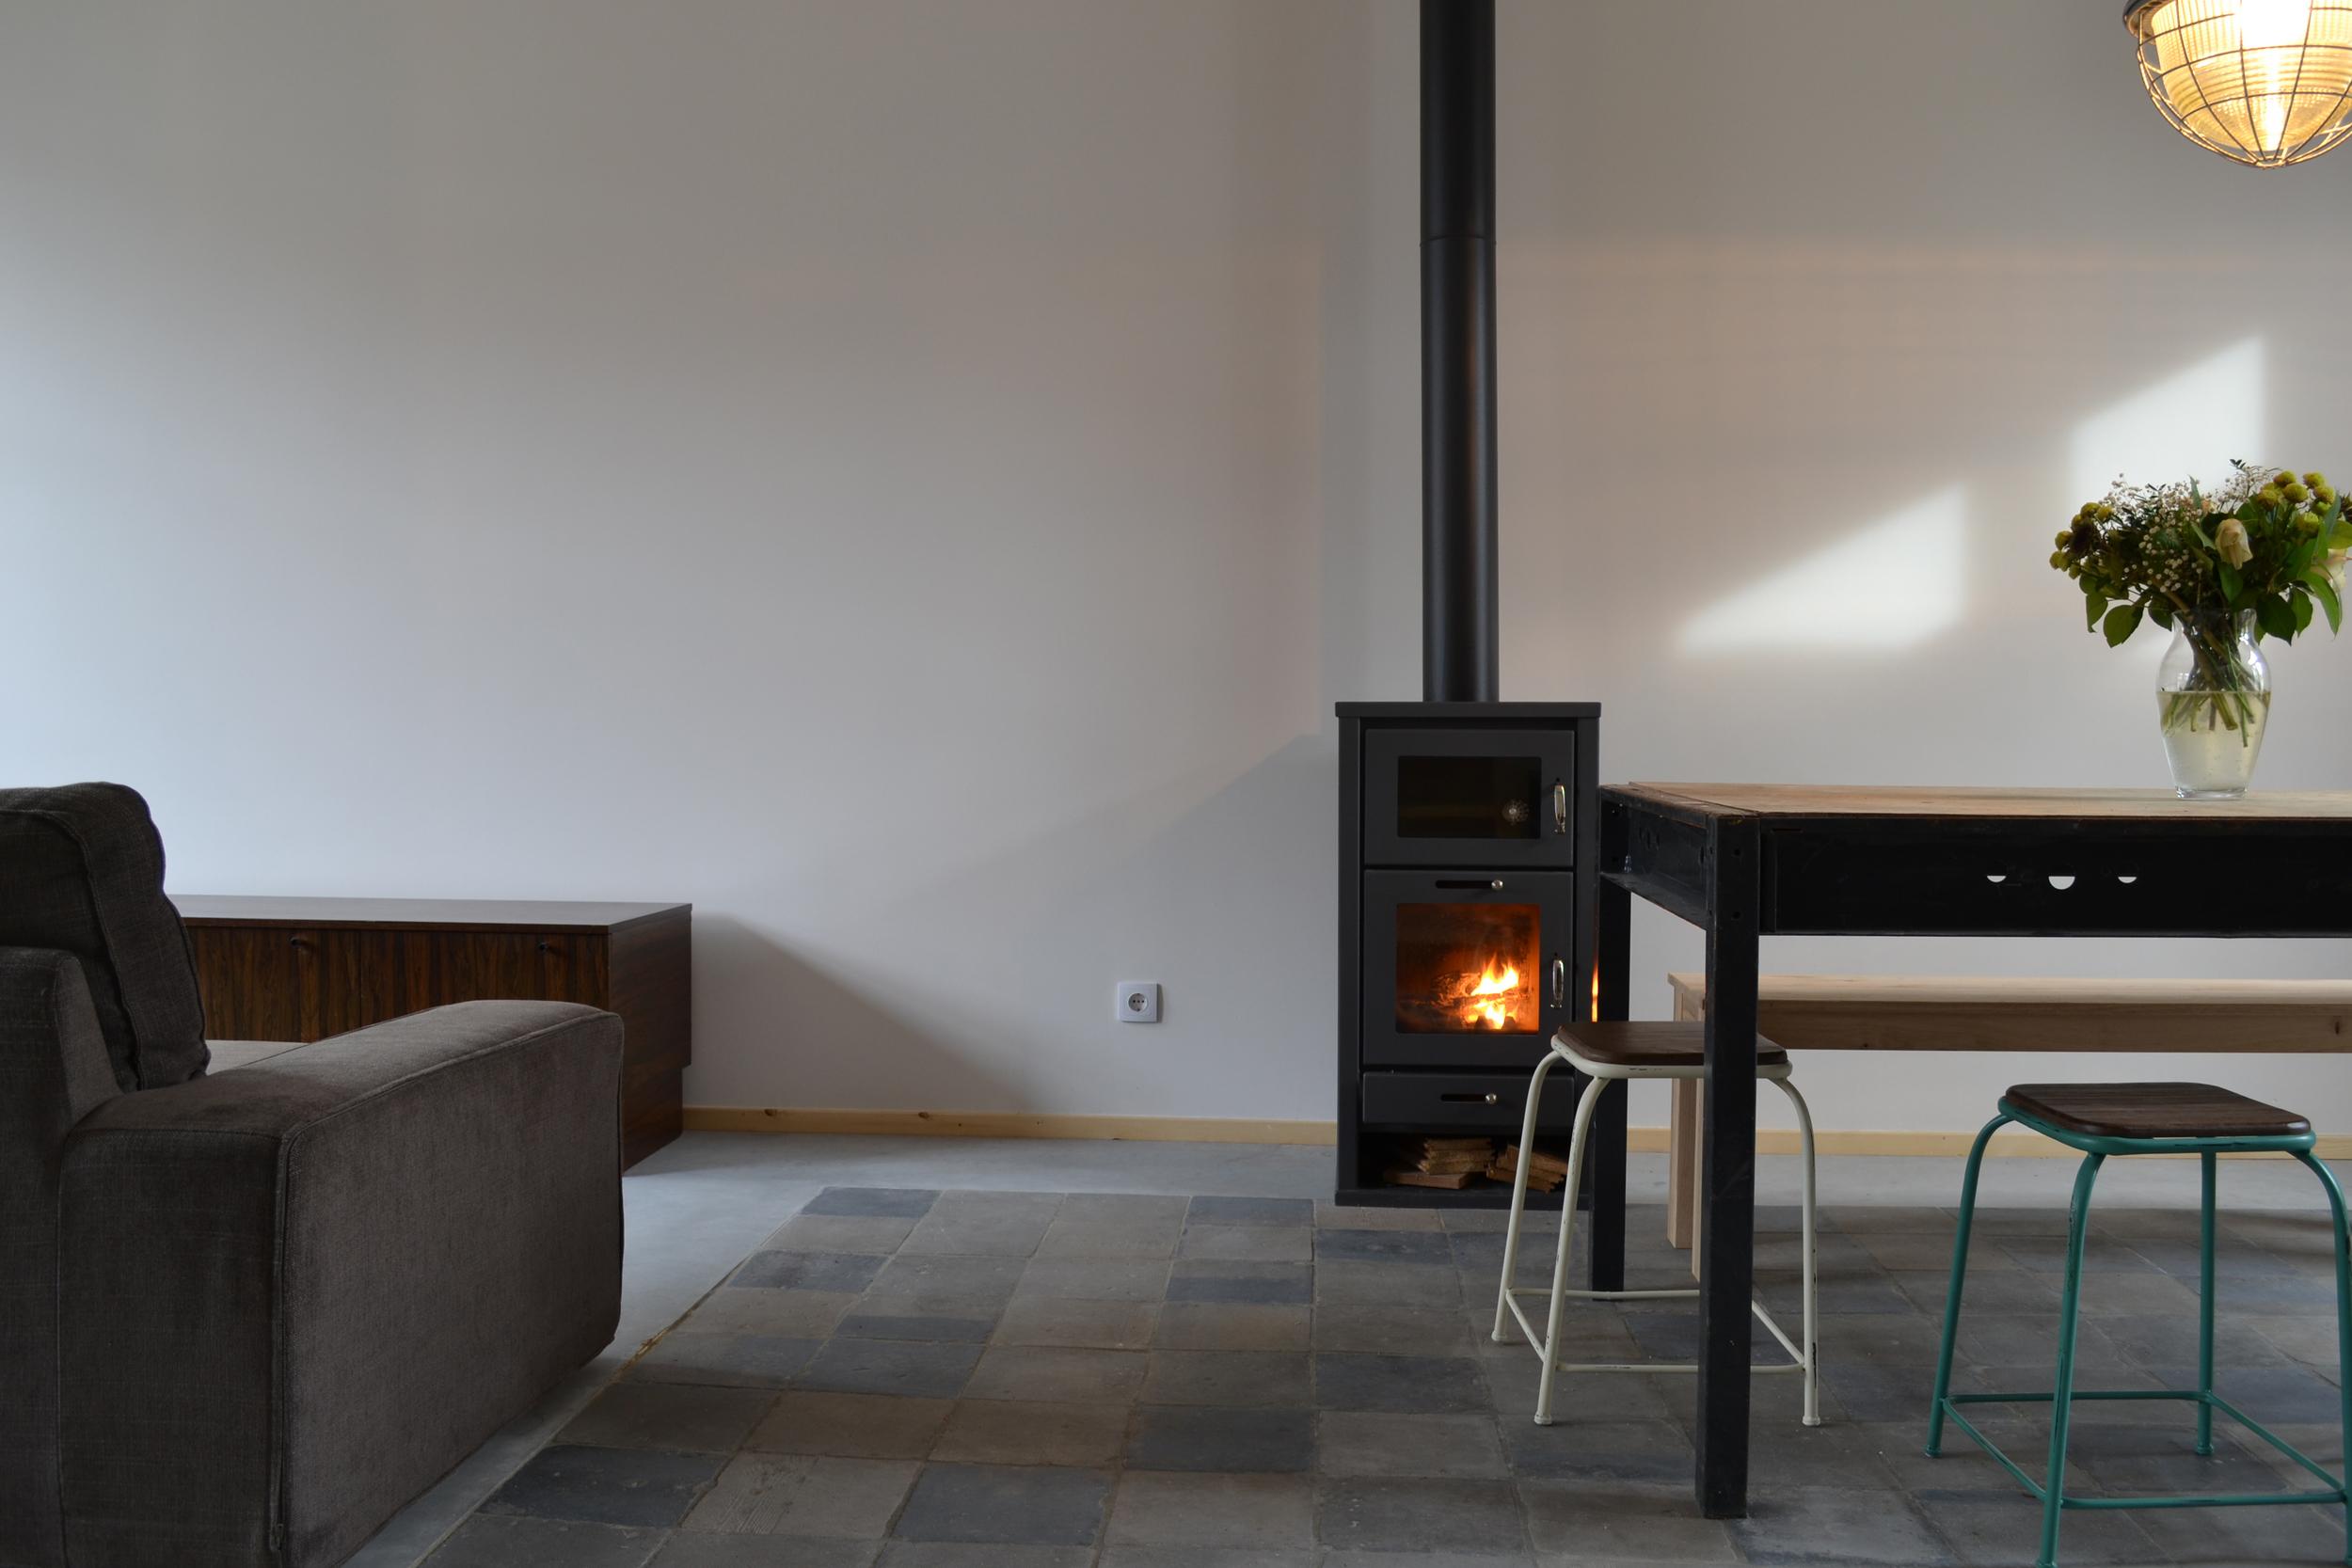 Daniel van Dijck Interior Architecture - Interieur architectuur